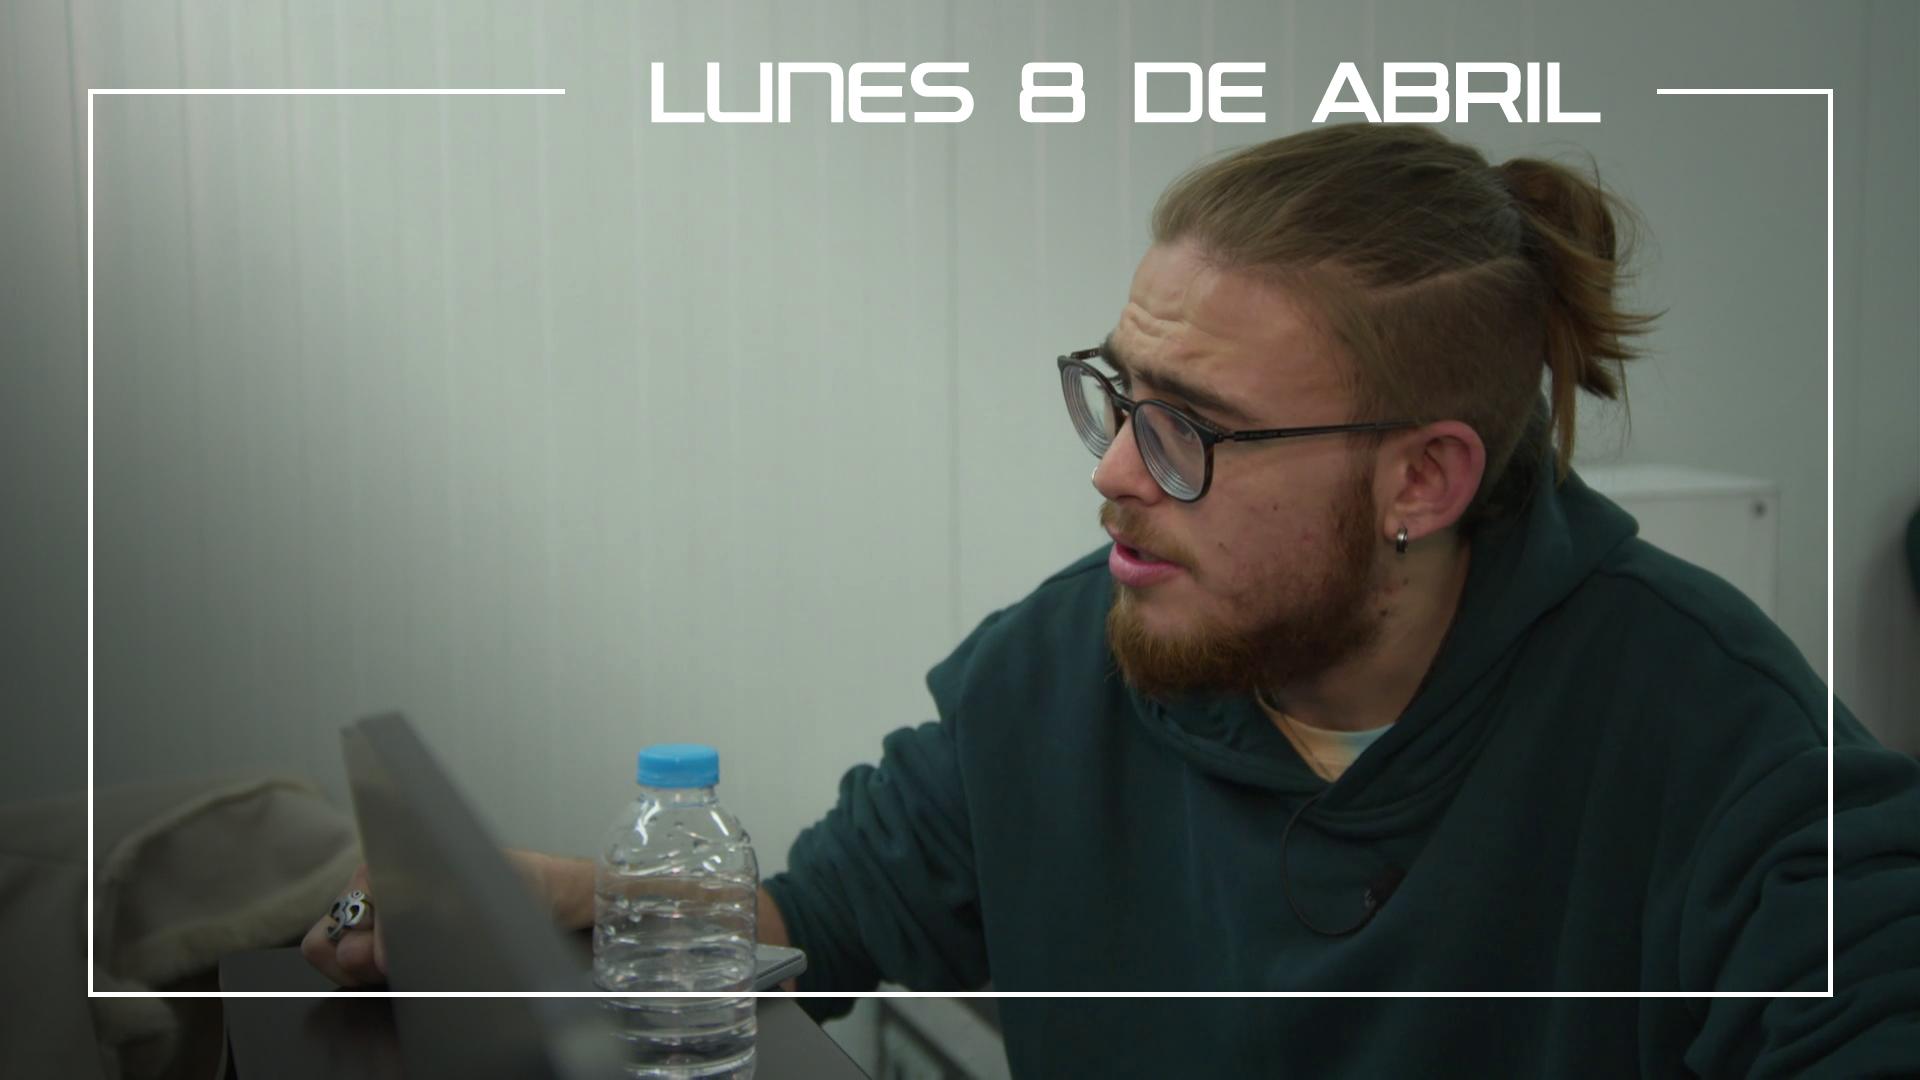 Lunes 8 de abril Andrés Martín ensaya 'When a man loves a woman' para la Final